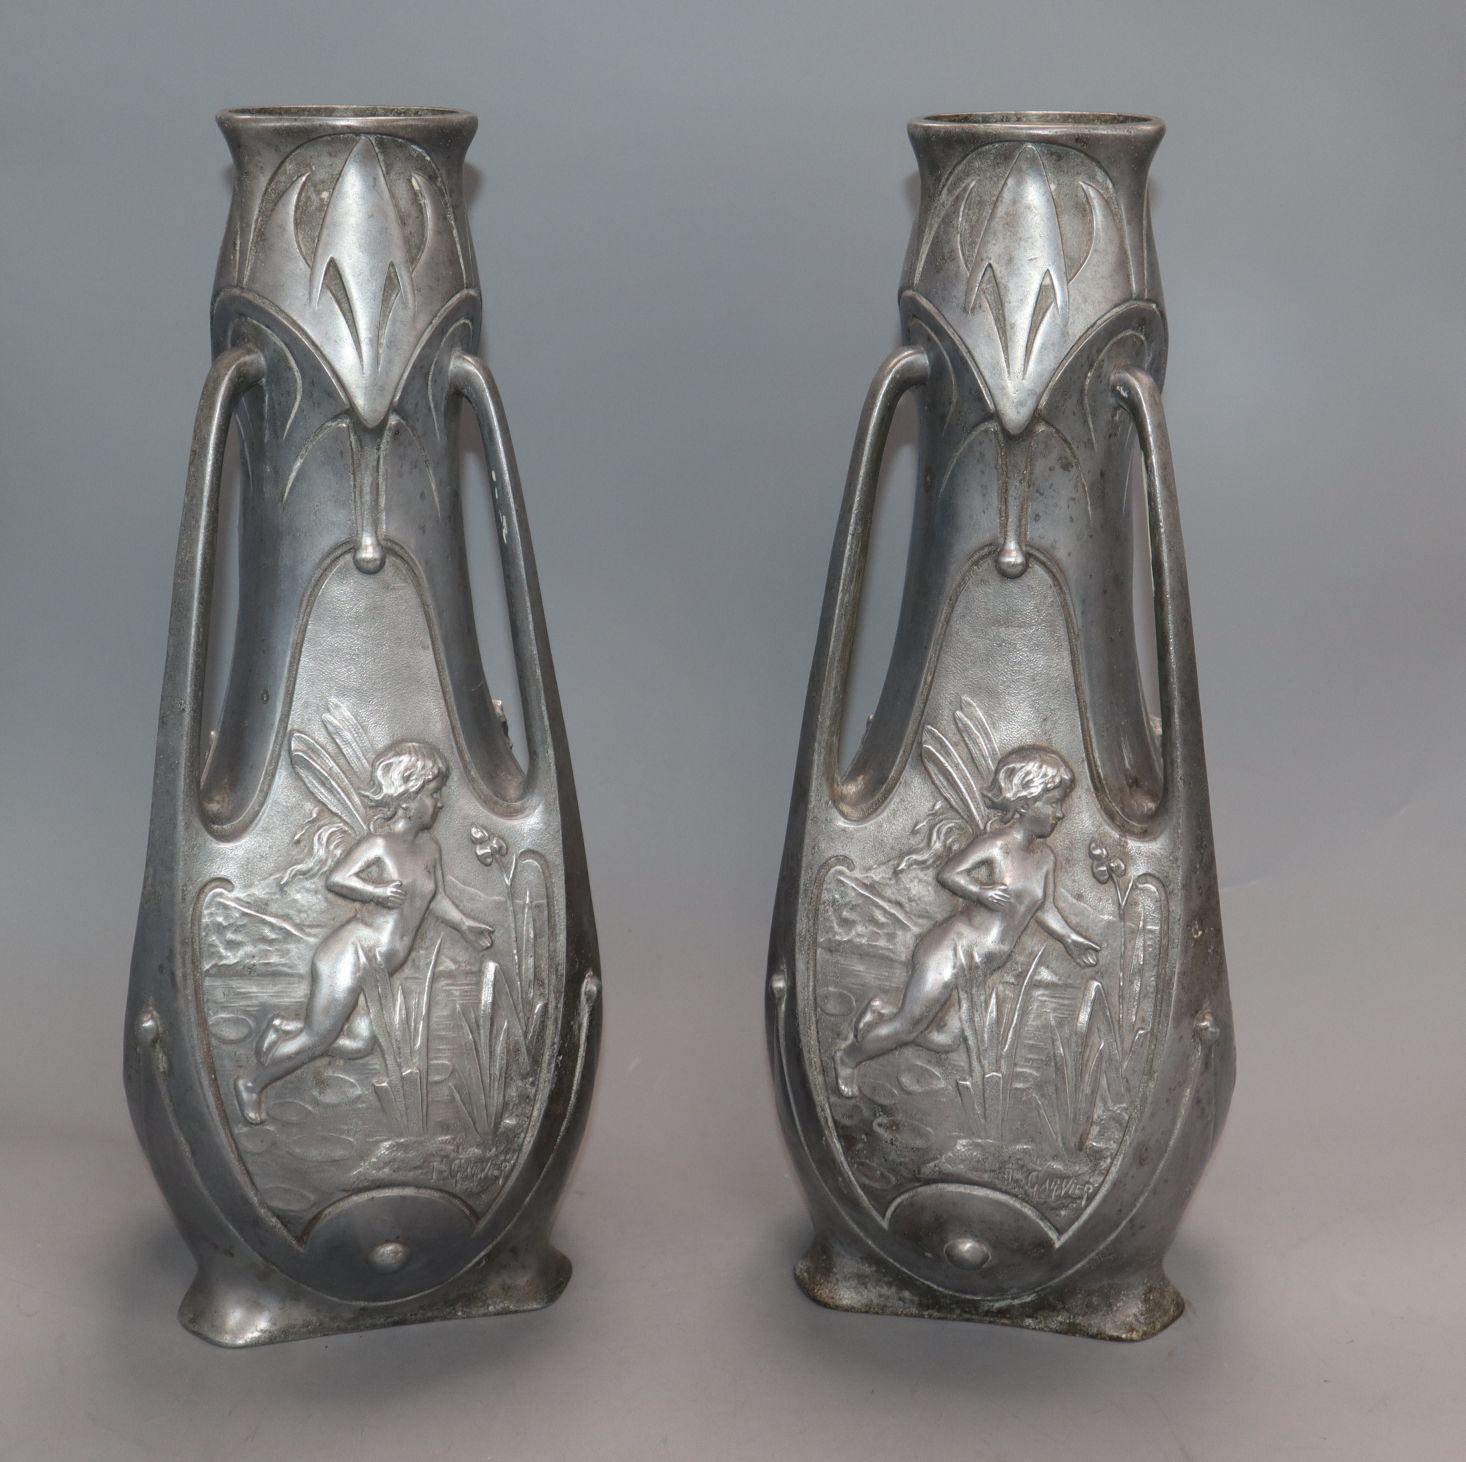 Lot 79 - A pair of pewter Art Nouveau vases, signed J.Garnier height 38cm